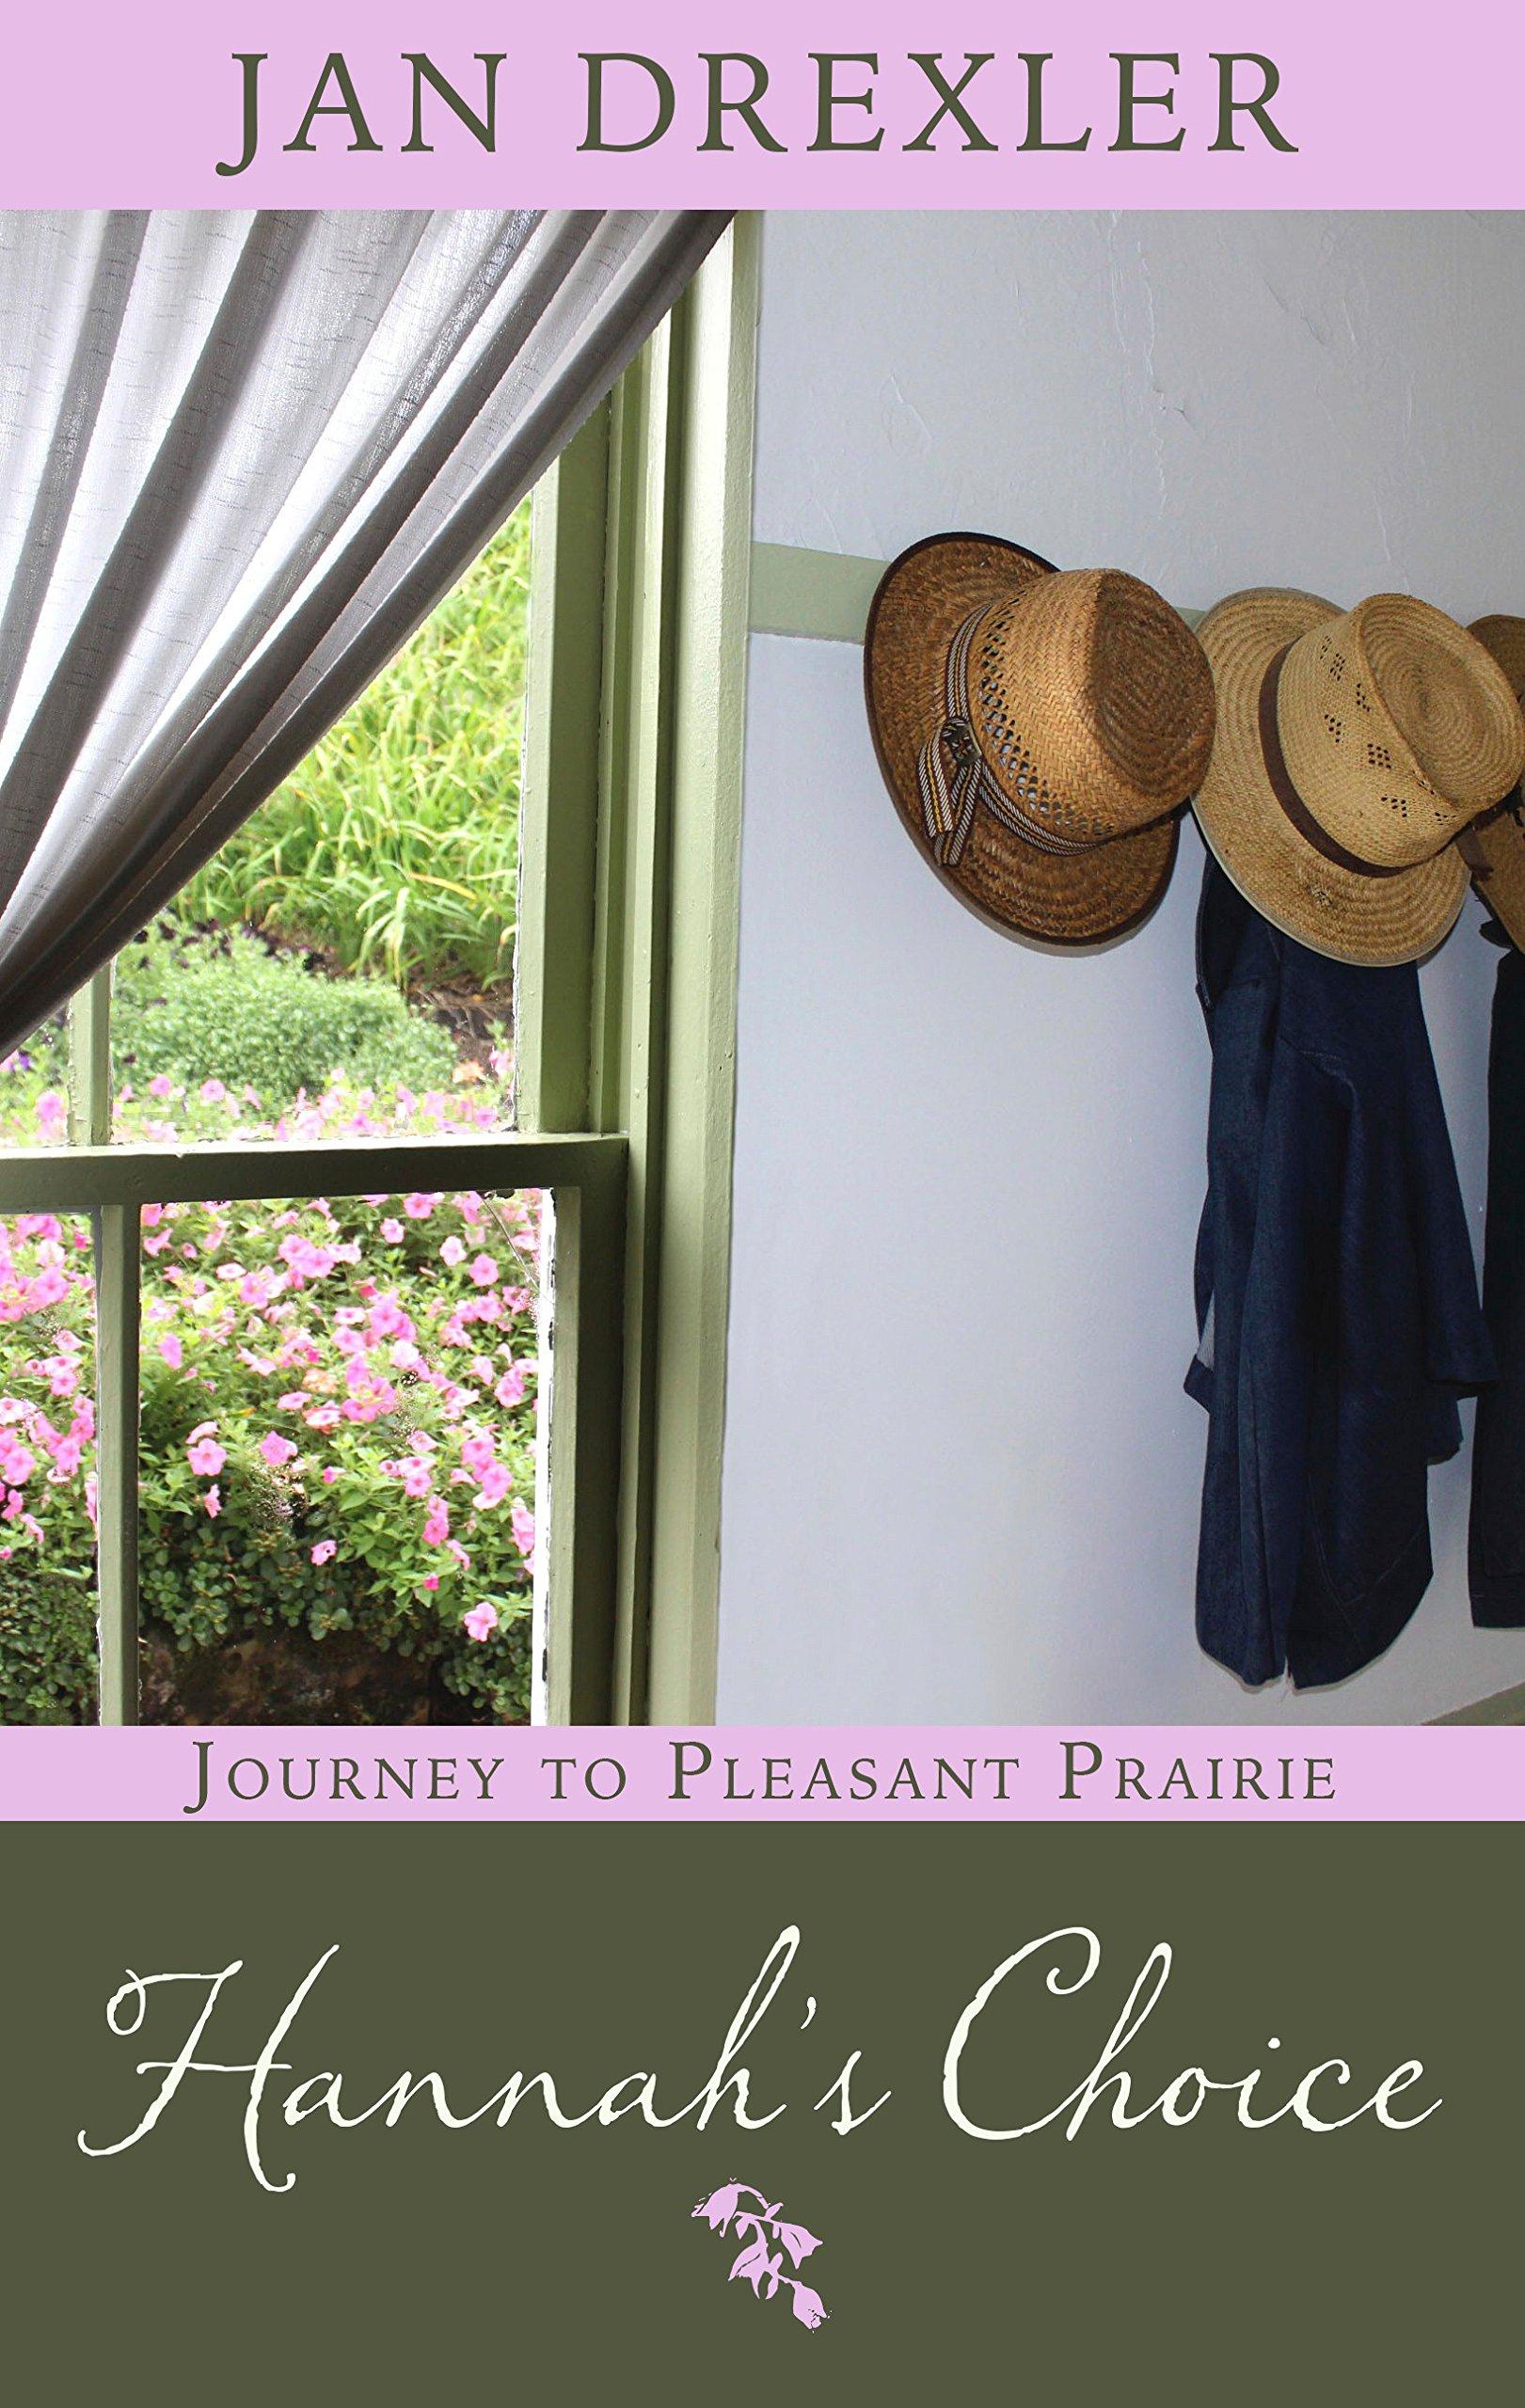 Hannah's Choice (Journey to Pleasant Prairie): Amazon.co.uk: Jan Drexler:  9781410487742: Books